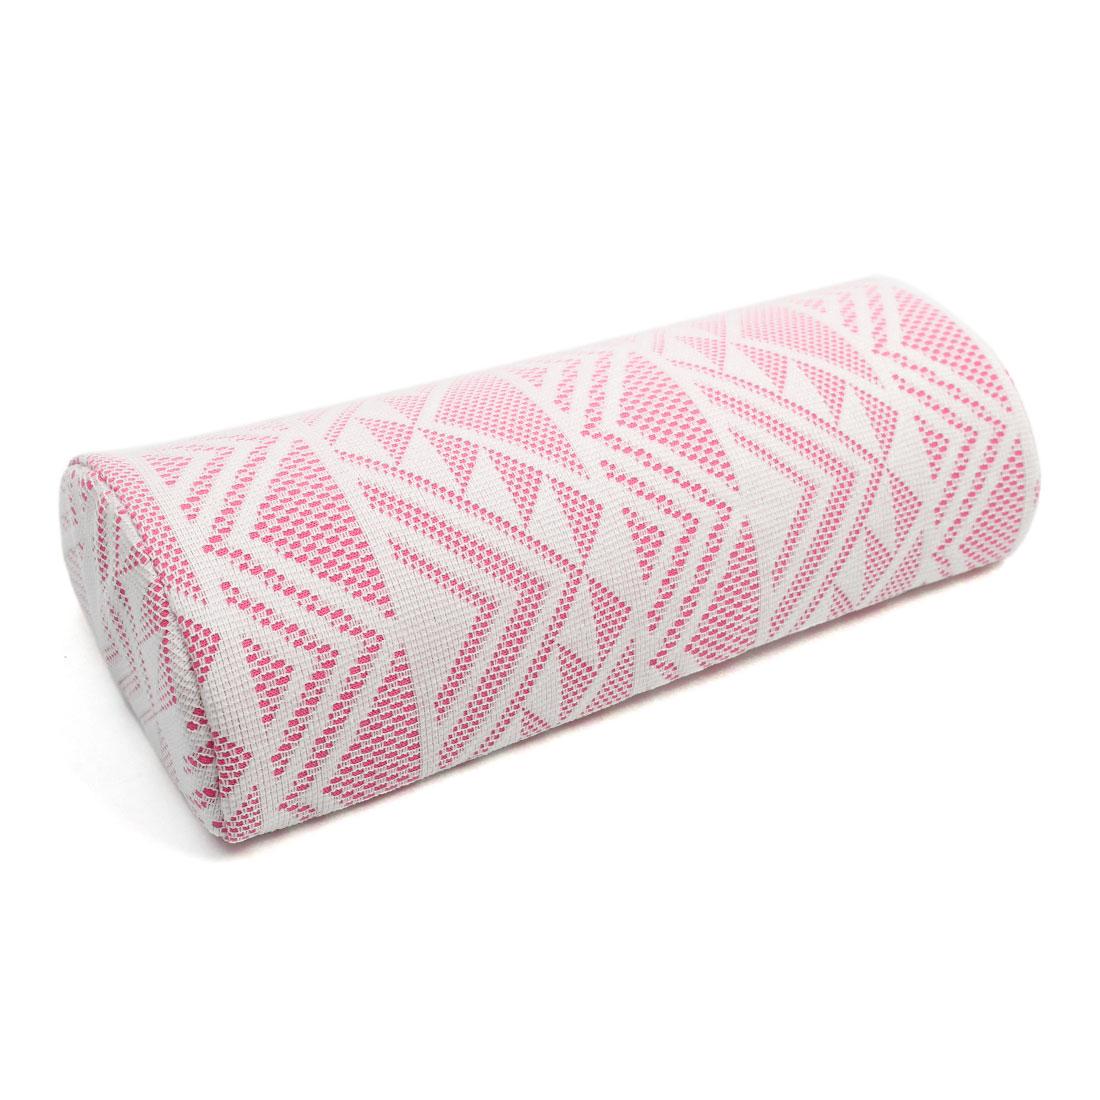 Pink Soft Geometric Printed Manicure Nail Art Hand Arm Rest Cushion Pillow Pad